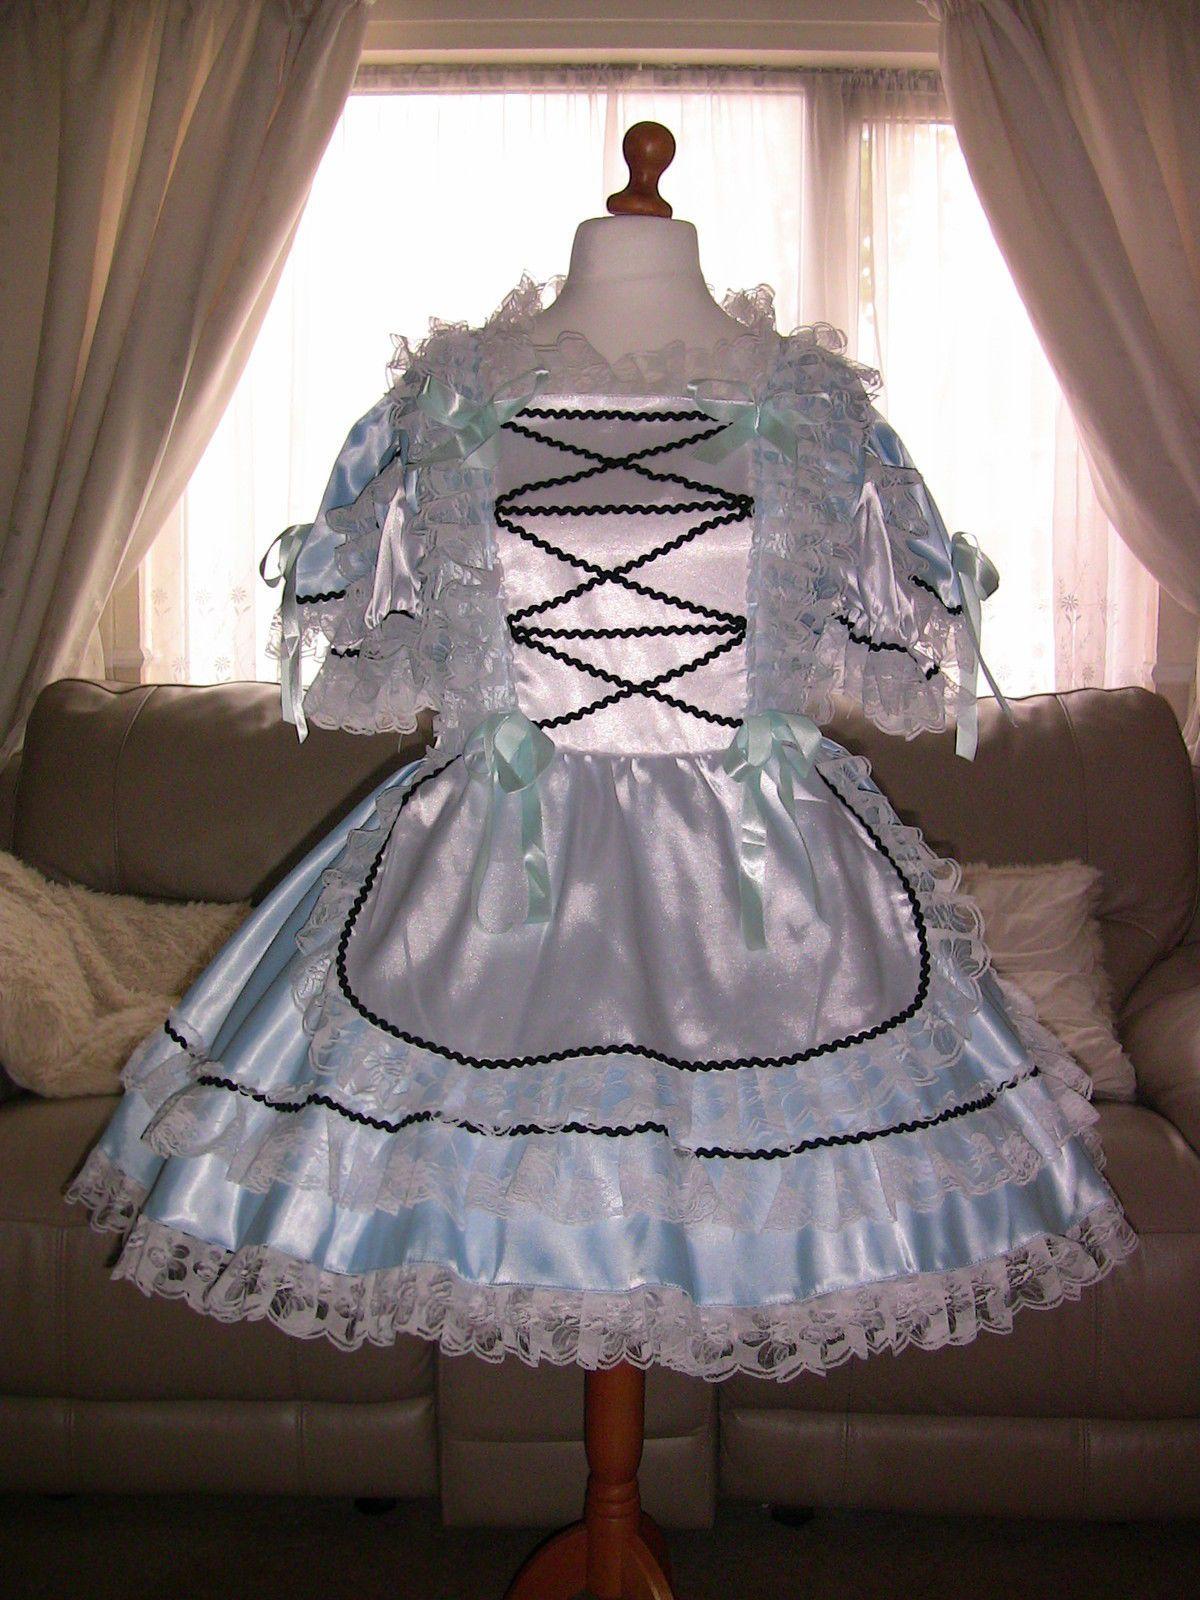 White apron maid - Amazing Blue Satin Adult Sissy Maids Dress With White Apron Size Xxl Ebay